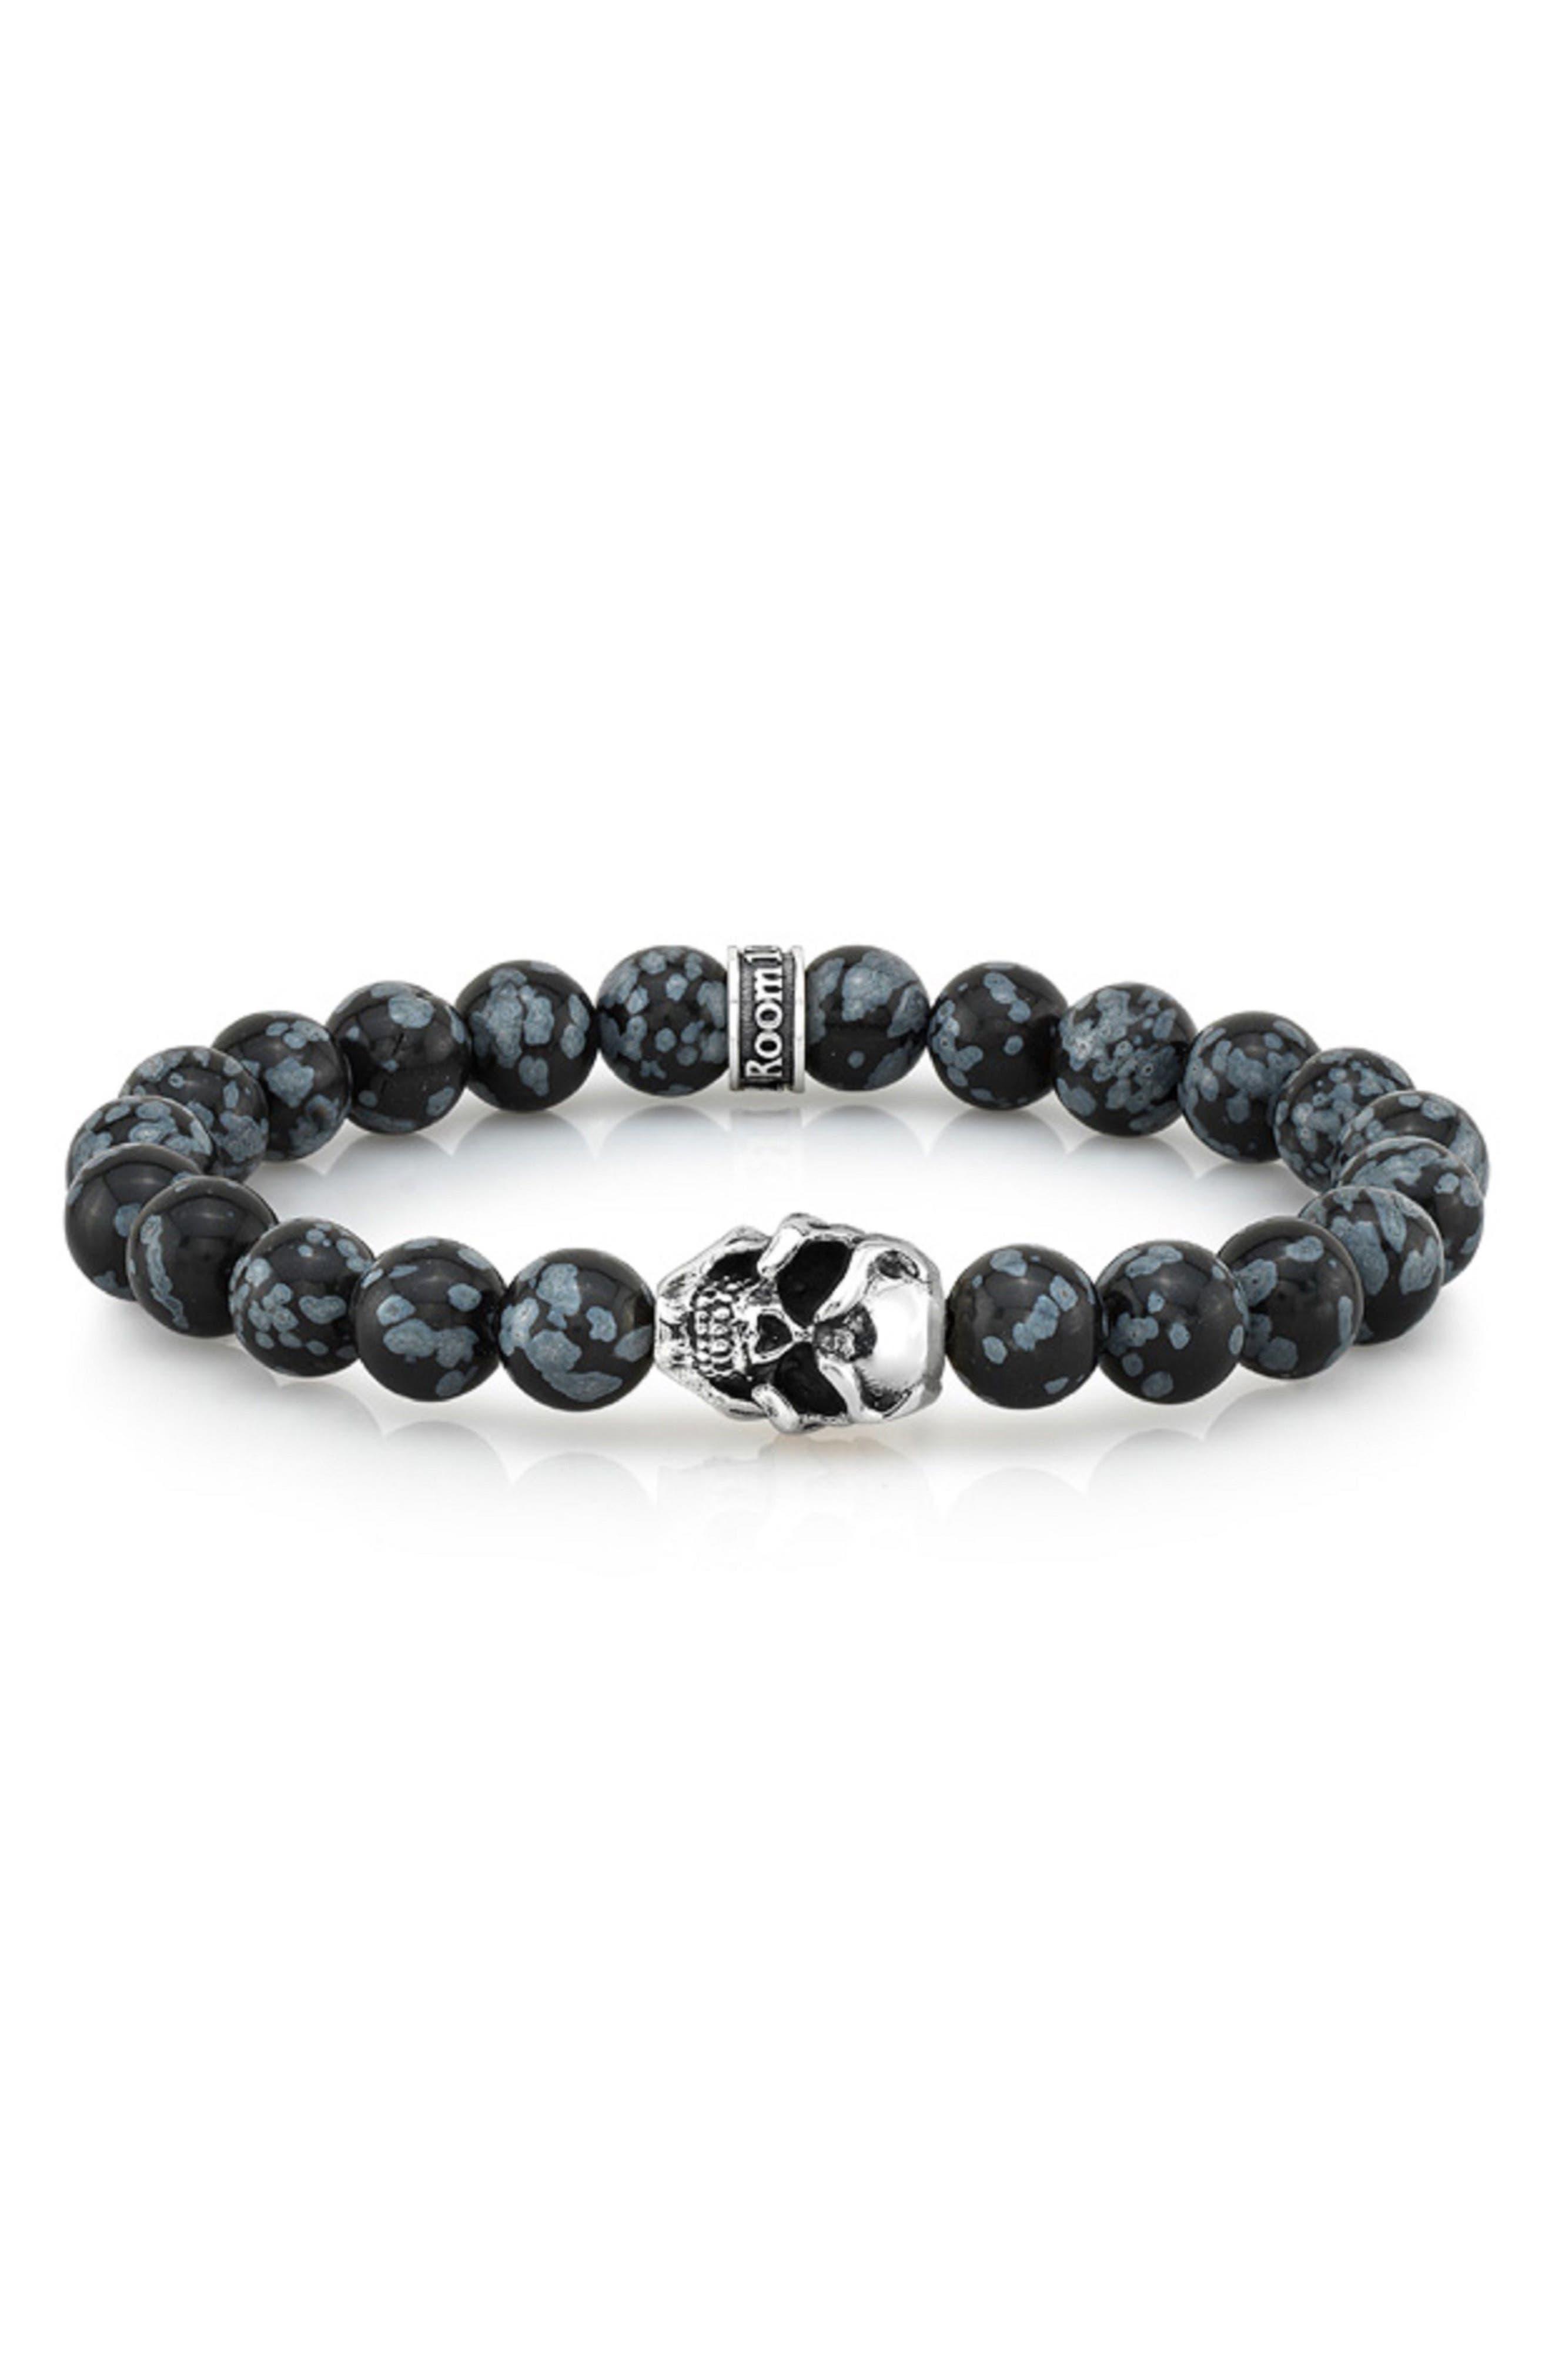 Room 101 Snowflake Agate Bead Bracelet,                         Main,                         color, Black